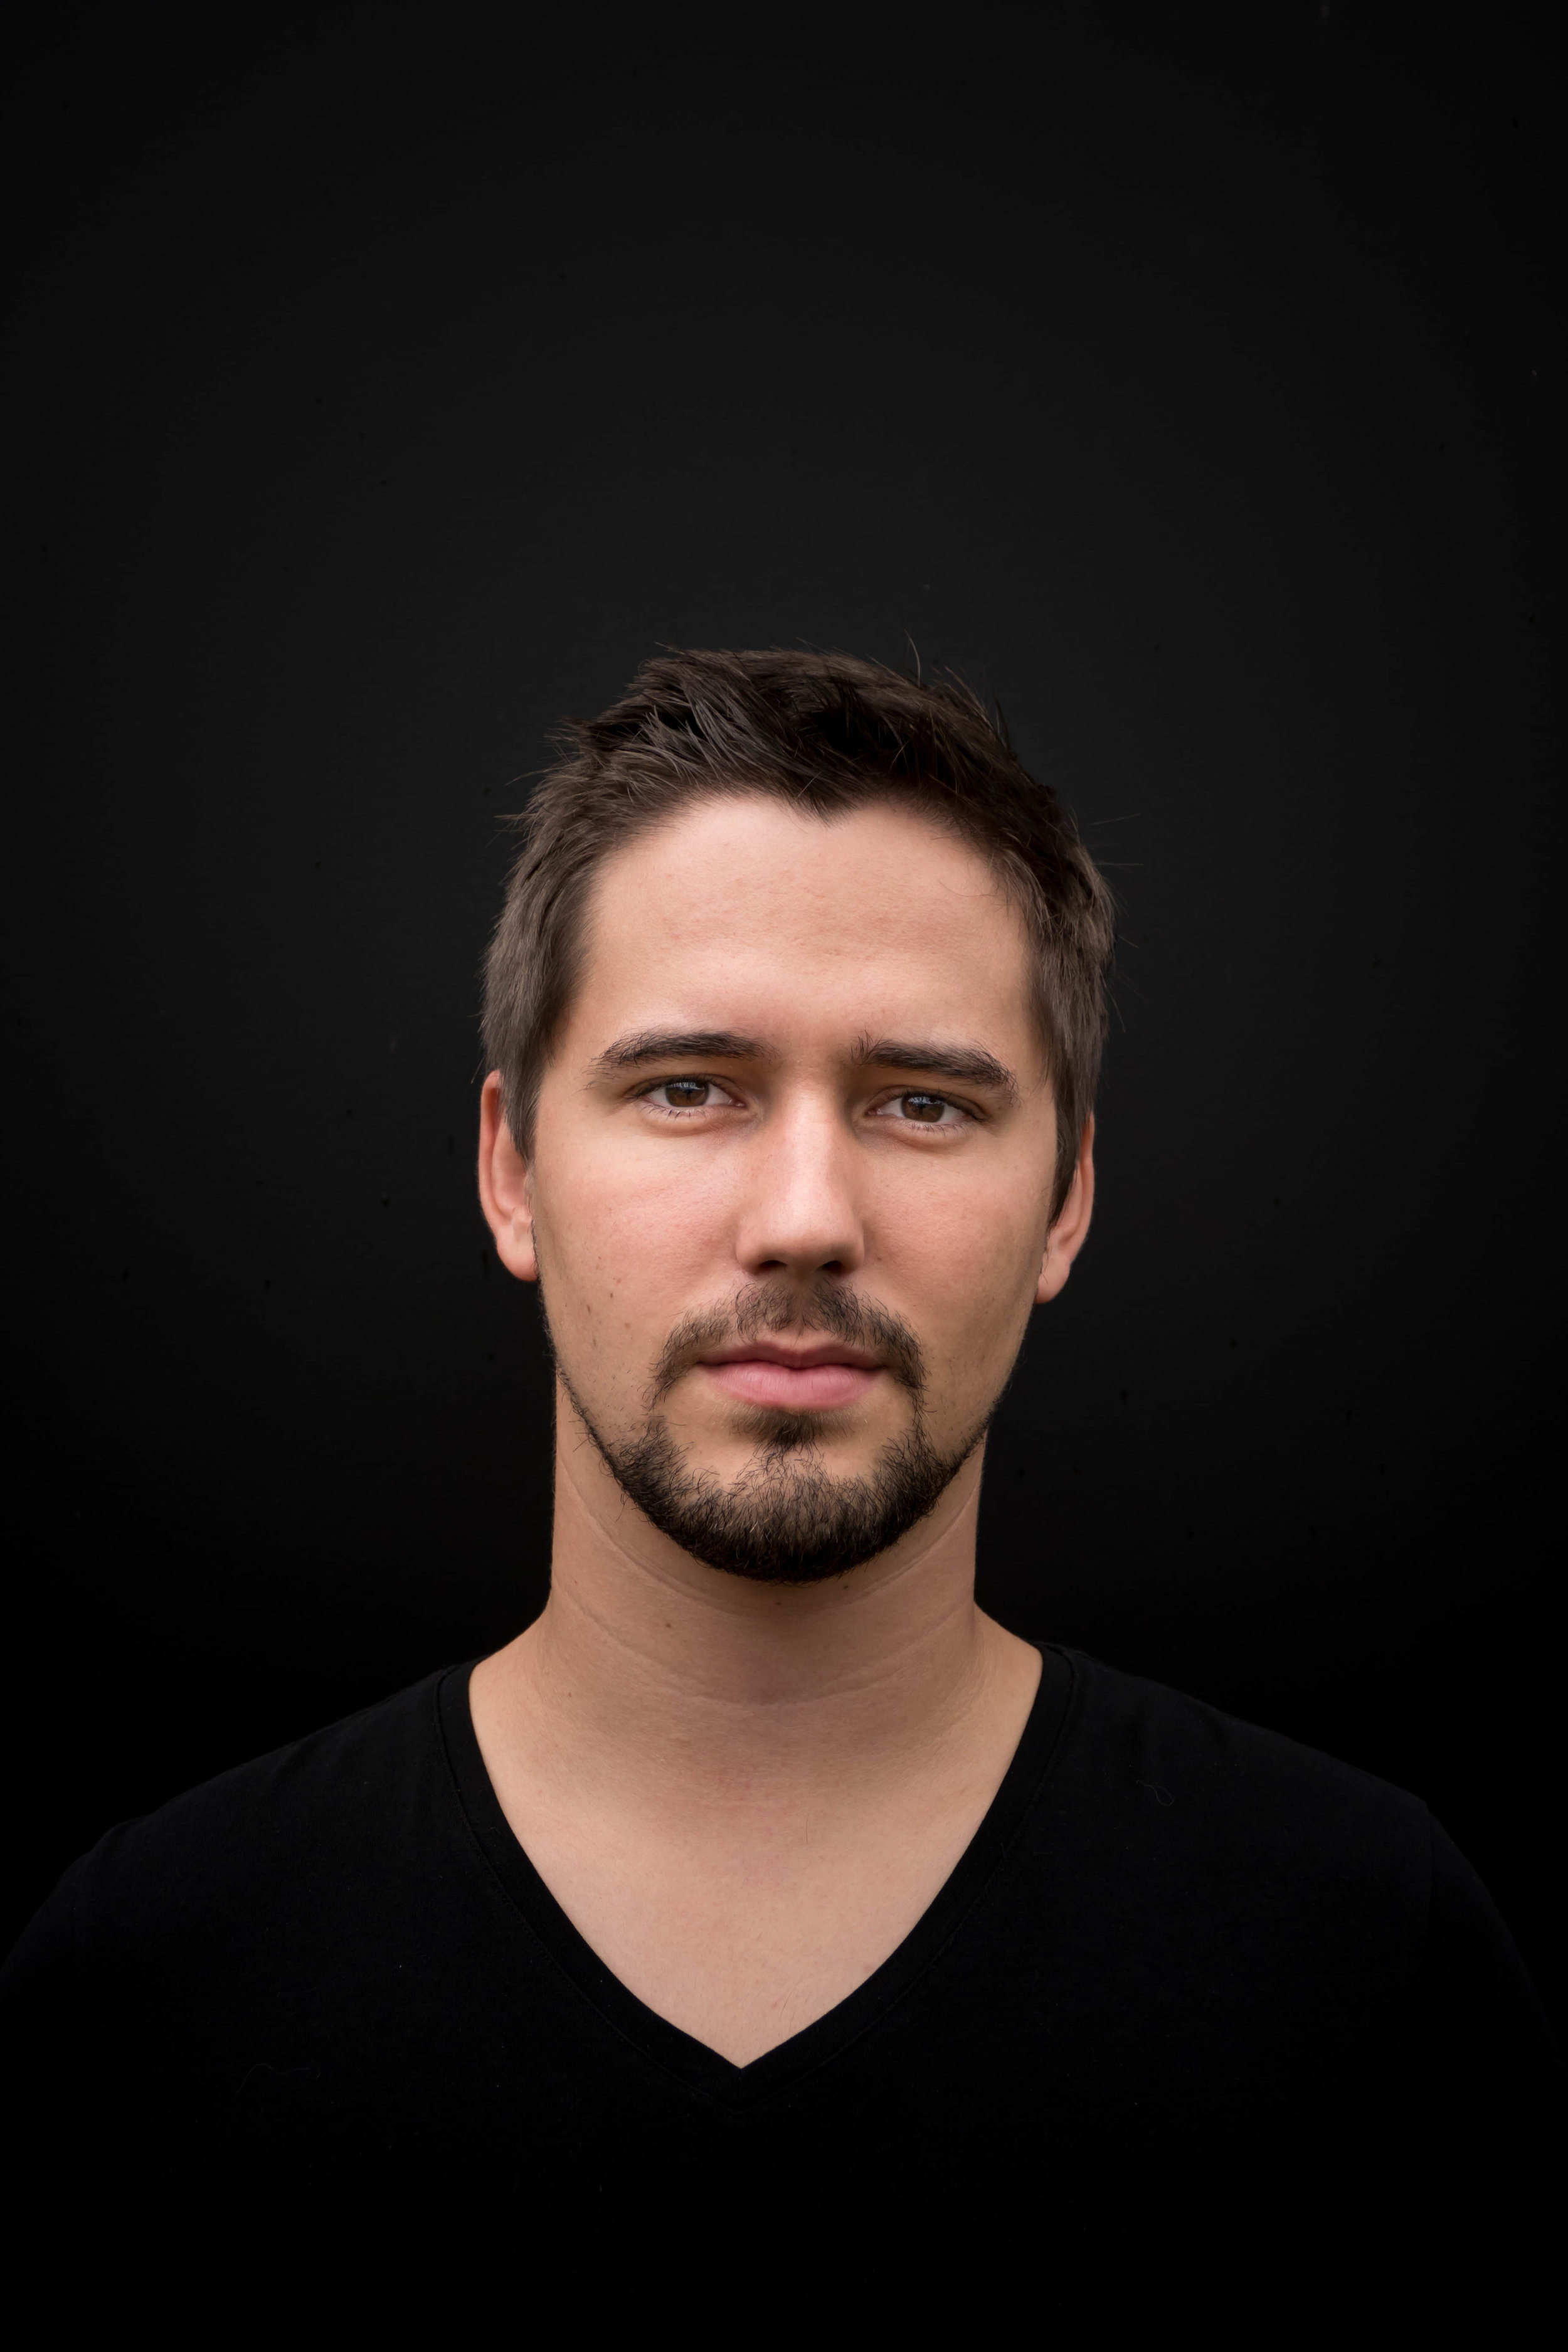 Robbert Kempeneers - Junior Architectrobbert.kempeneers@axcis.be